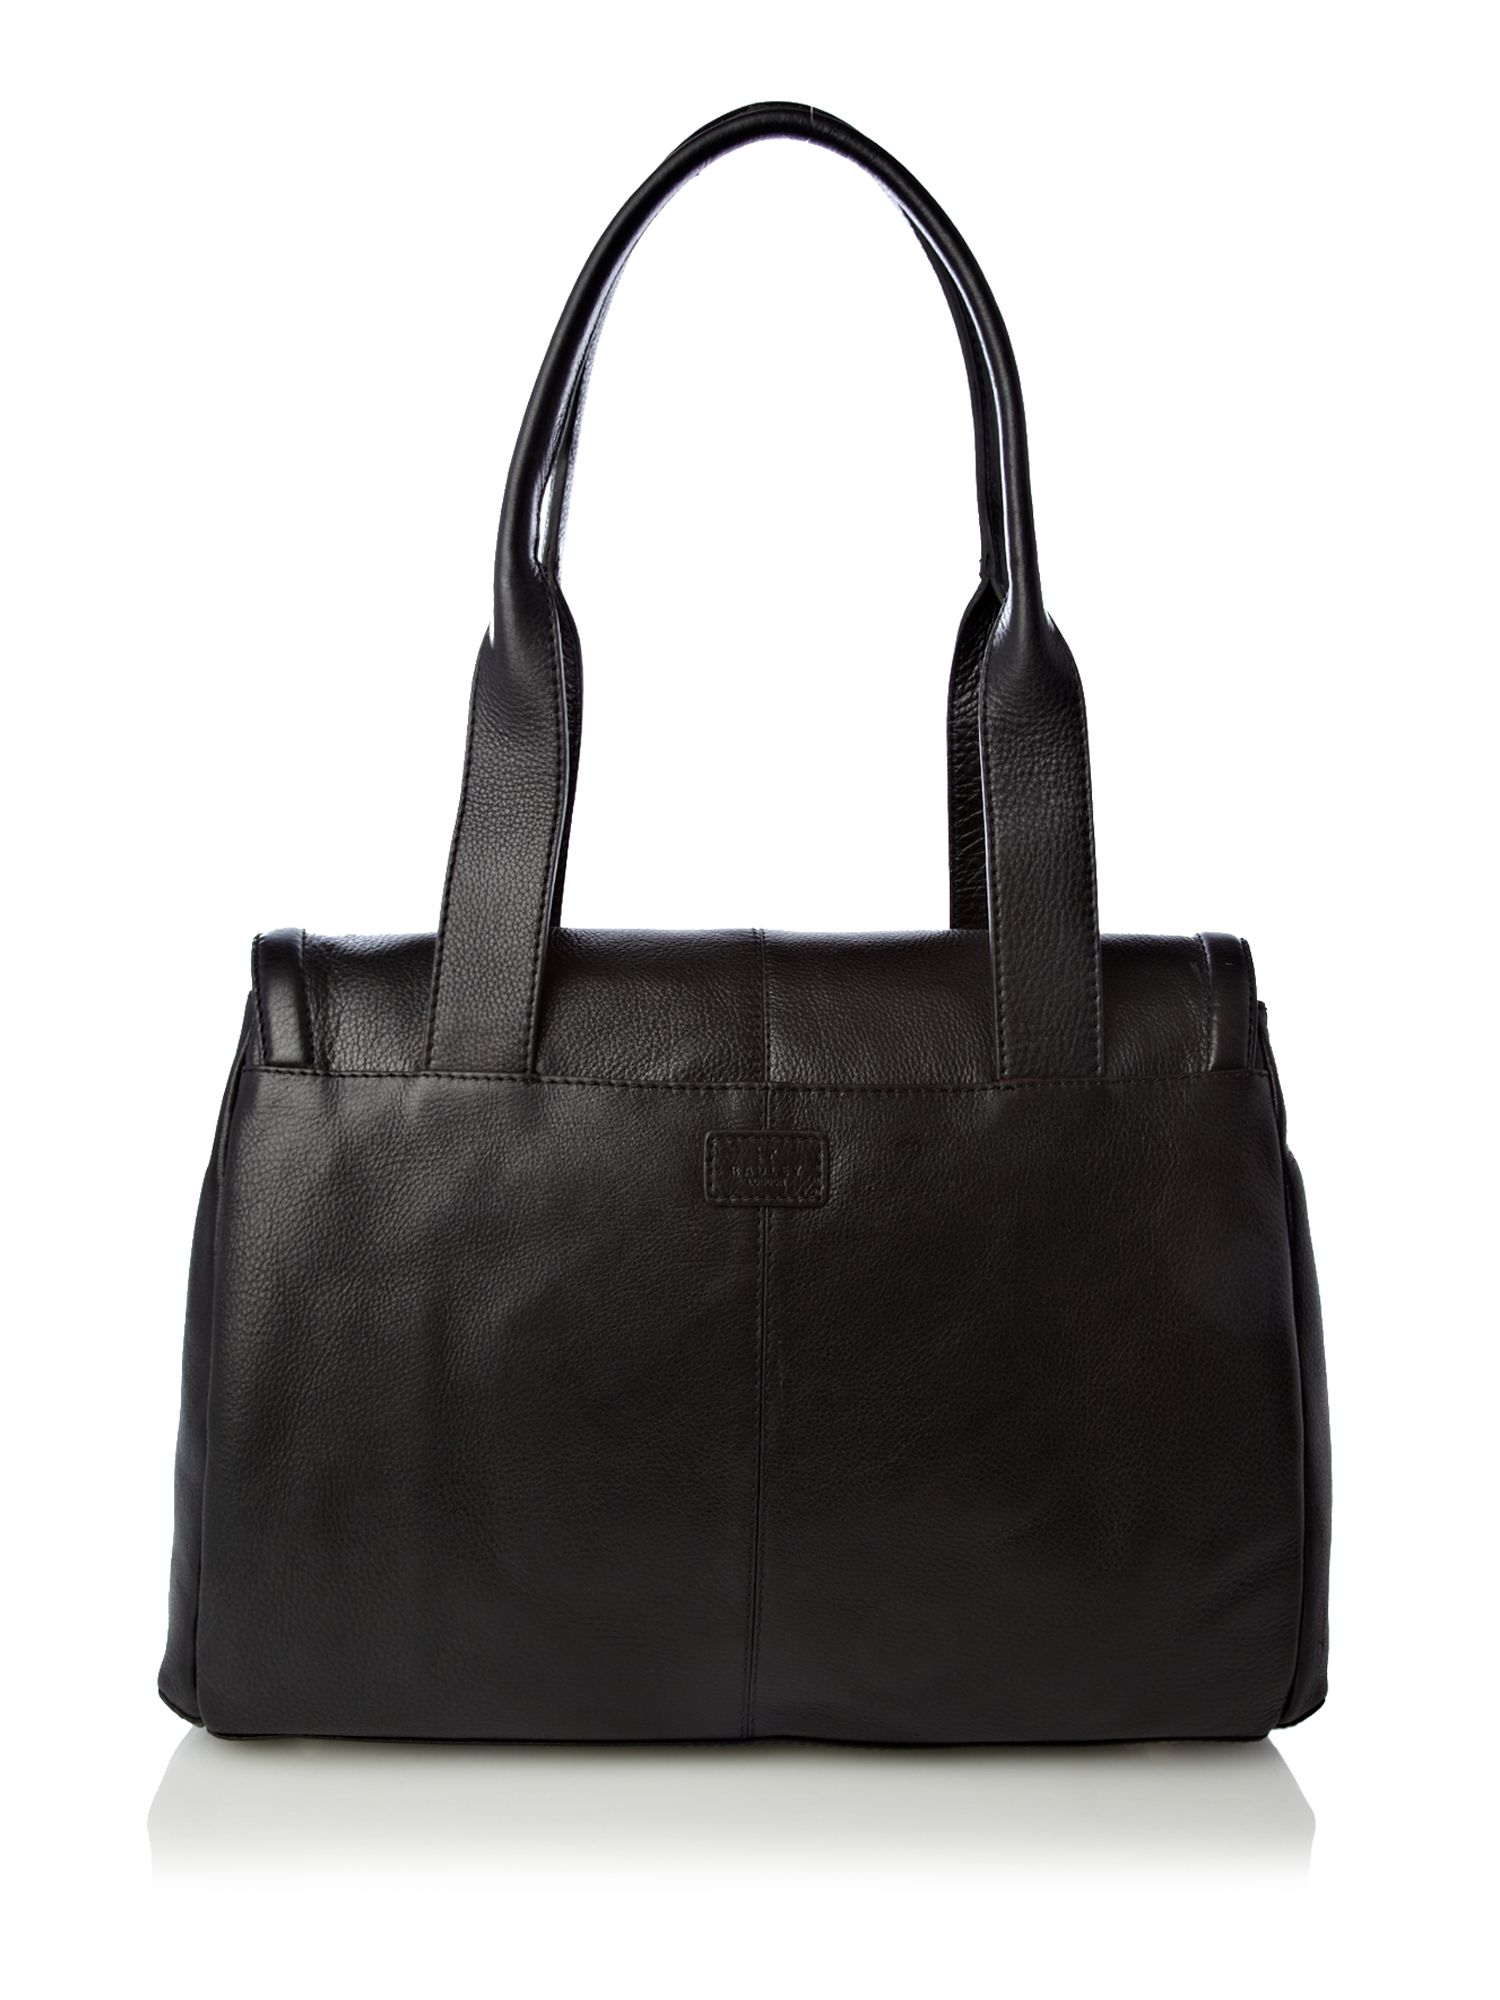 Radley Cheadle Large Flapover Tote Bag in Black